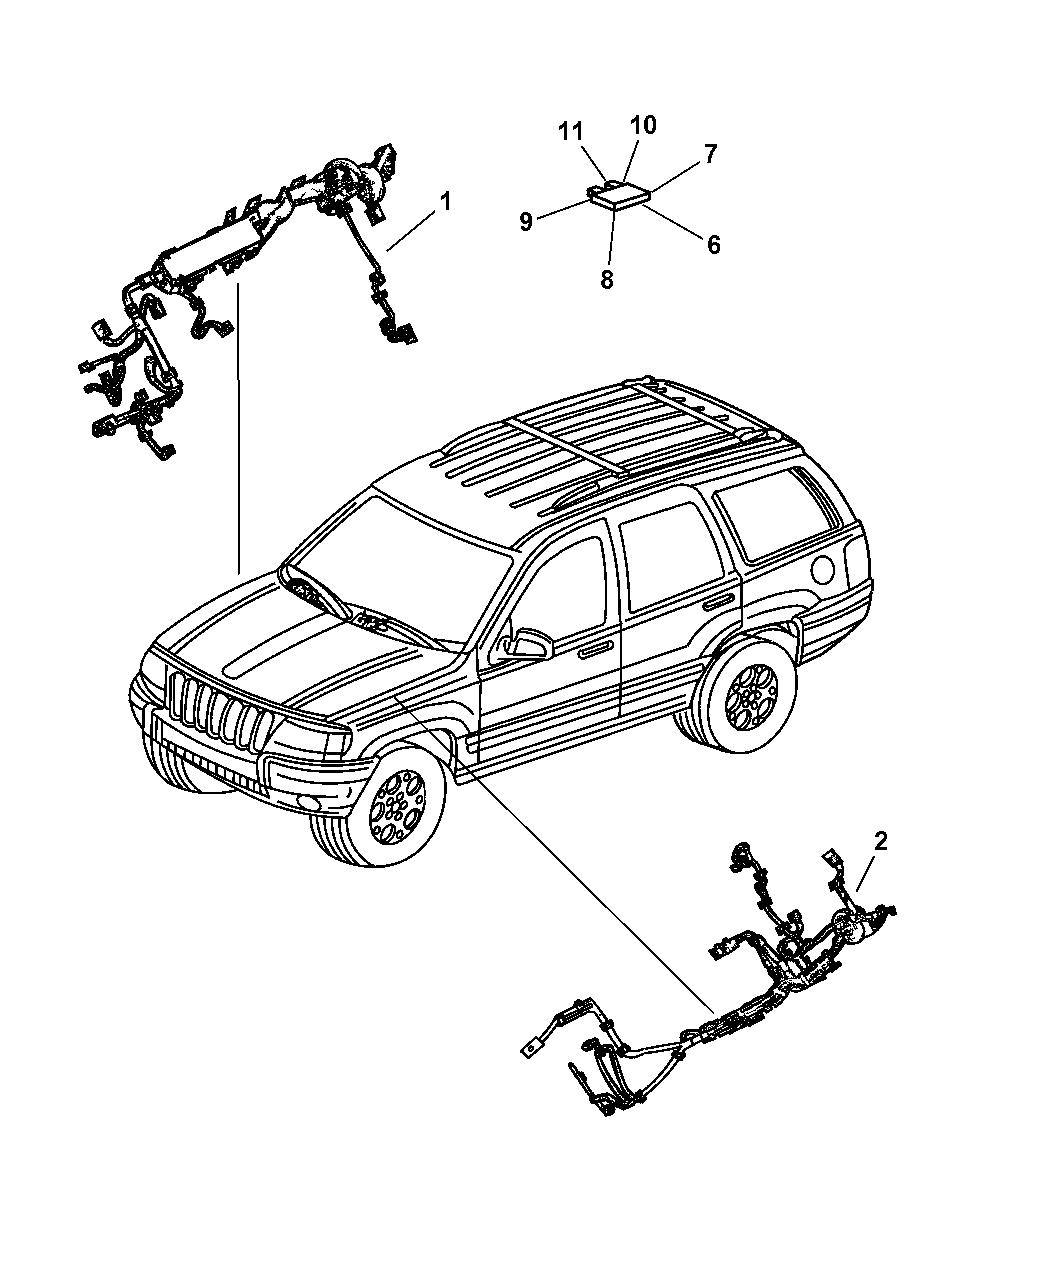 Wiring Diagram PDF: 2002 Jeep Grand Cherokee Wiring